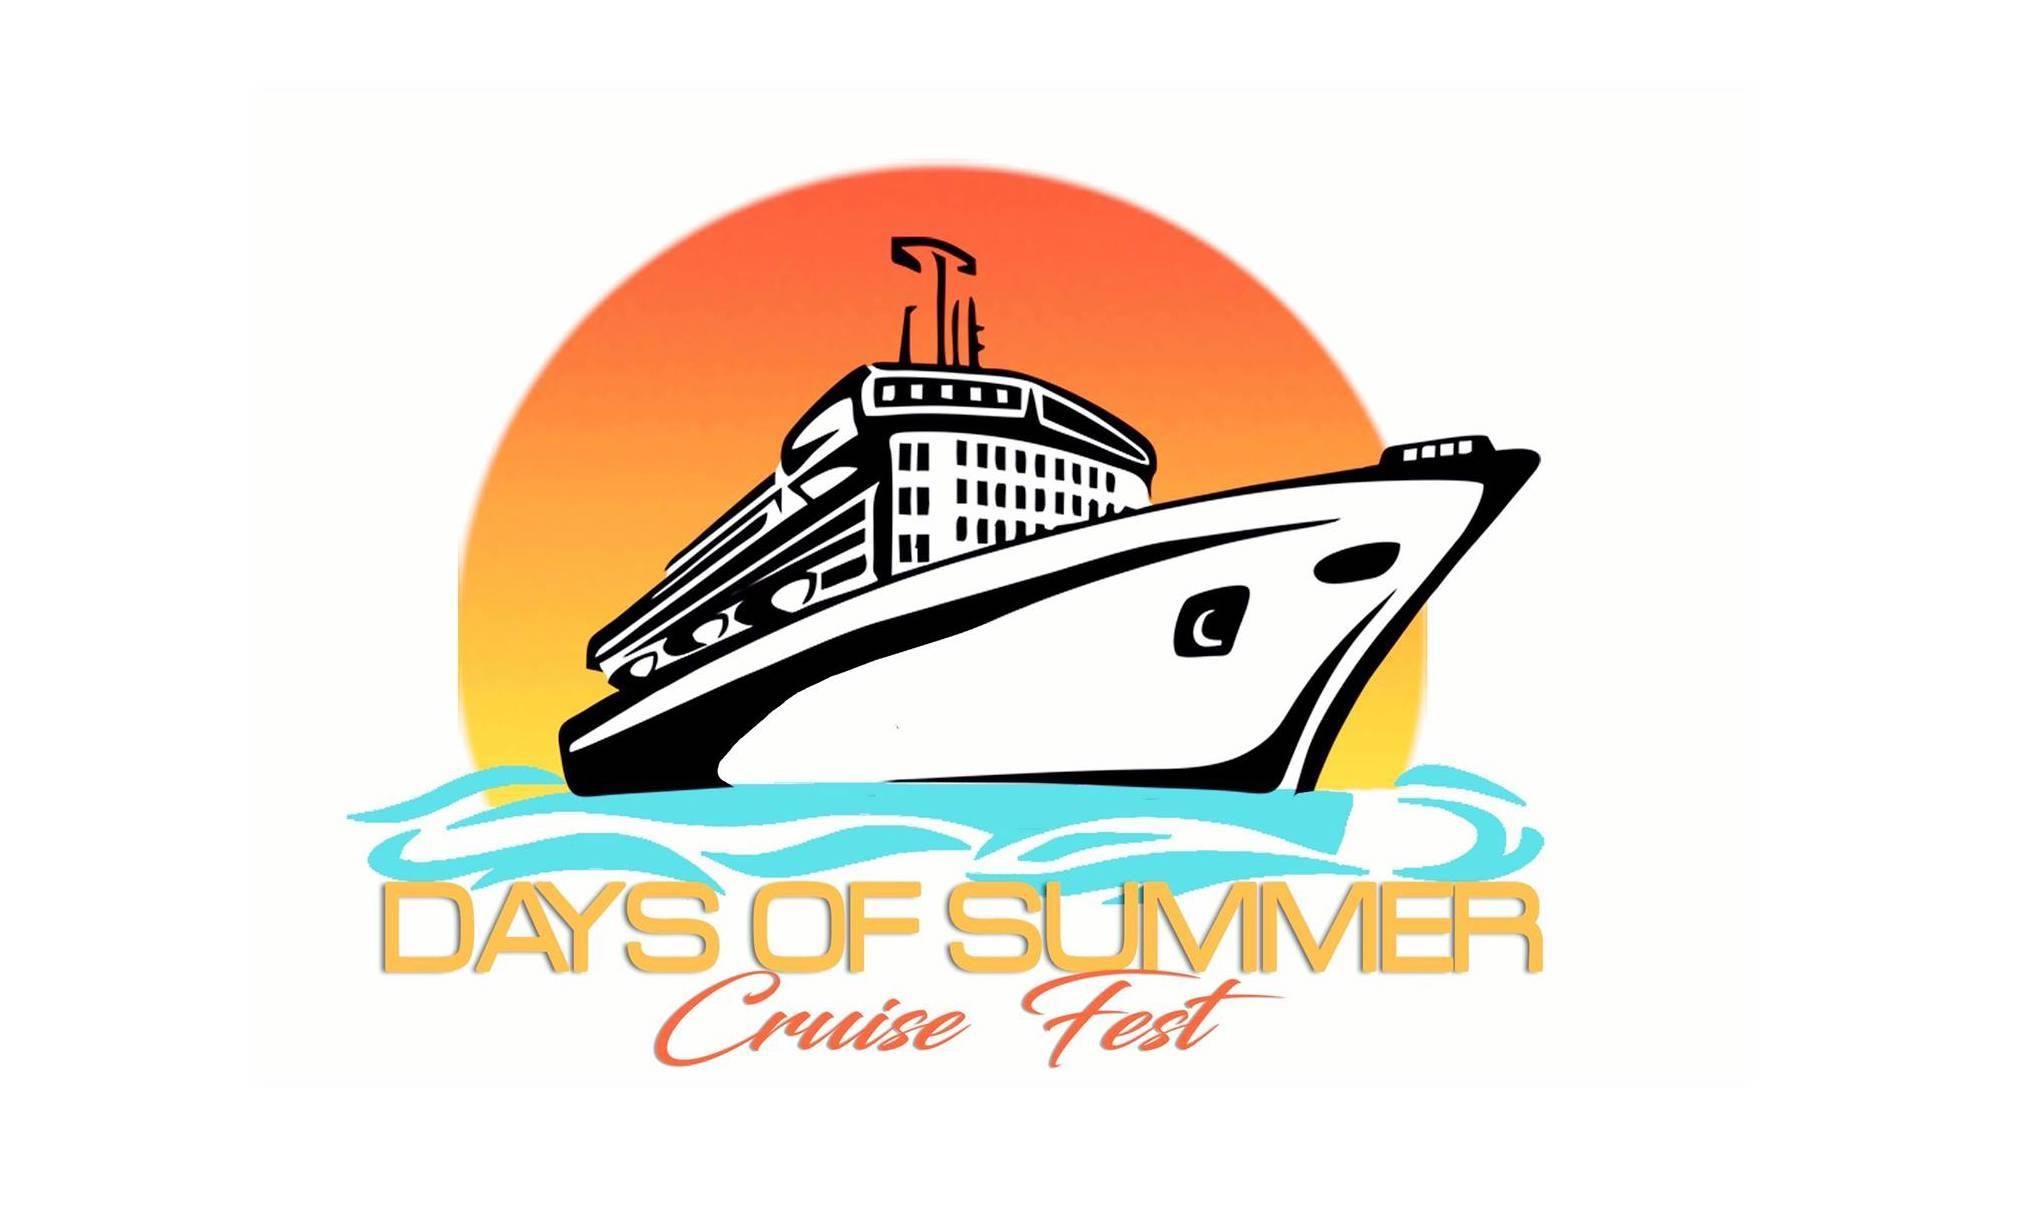 Cruise Hip Hop Festival